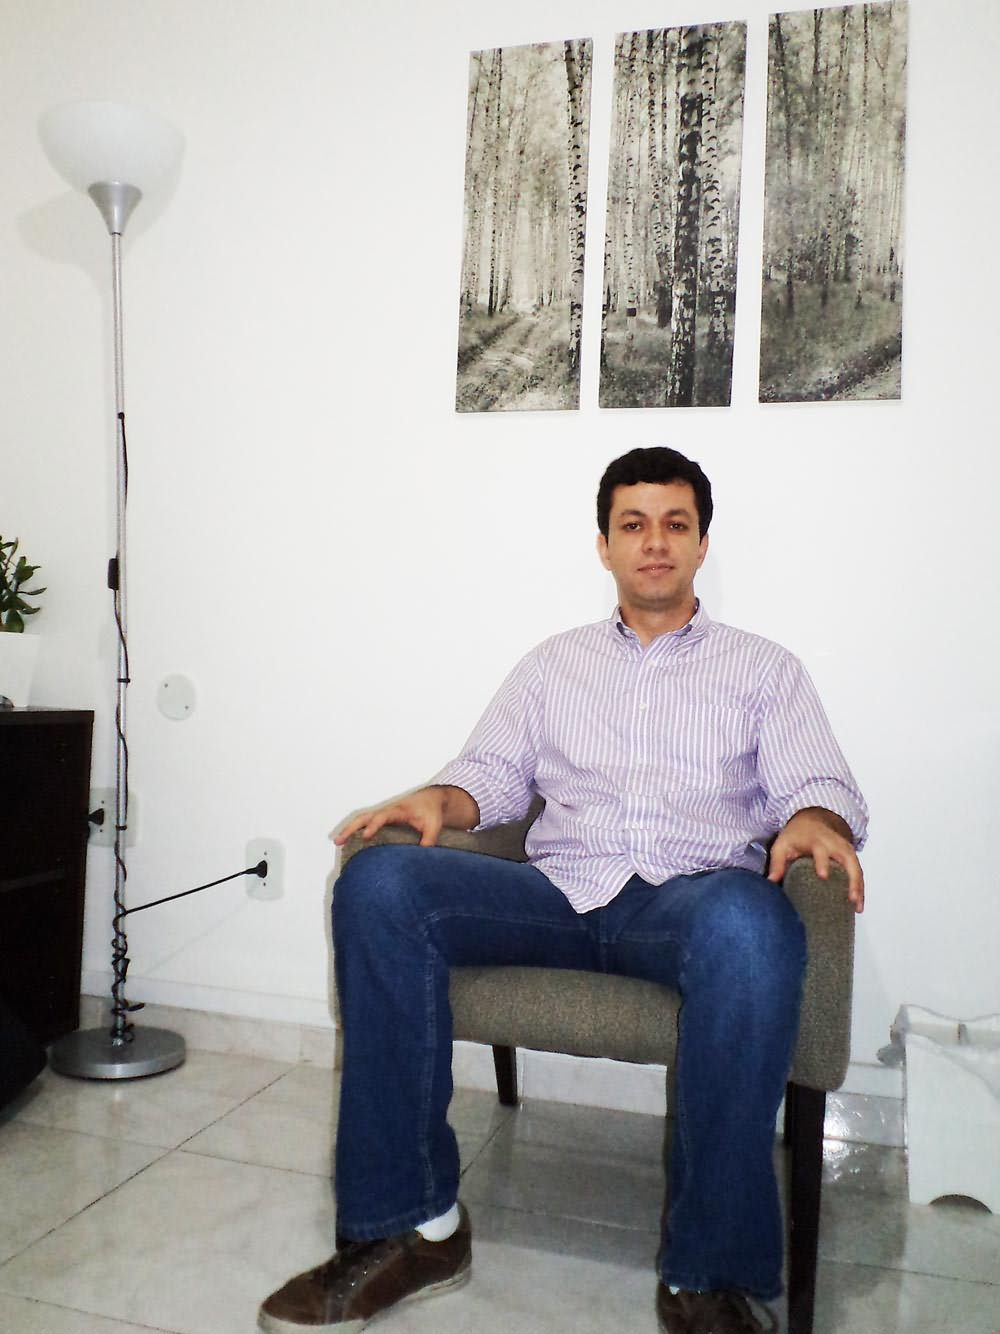 Psicólogo - Copacabana - Largo do Machado | Alexandre